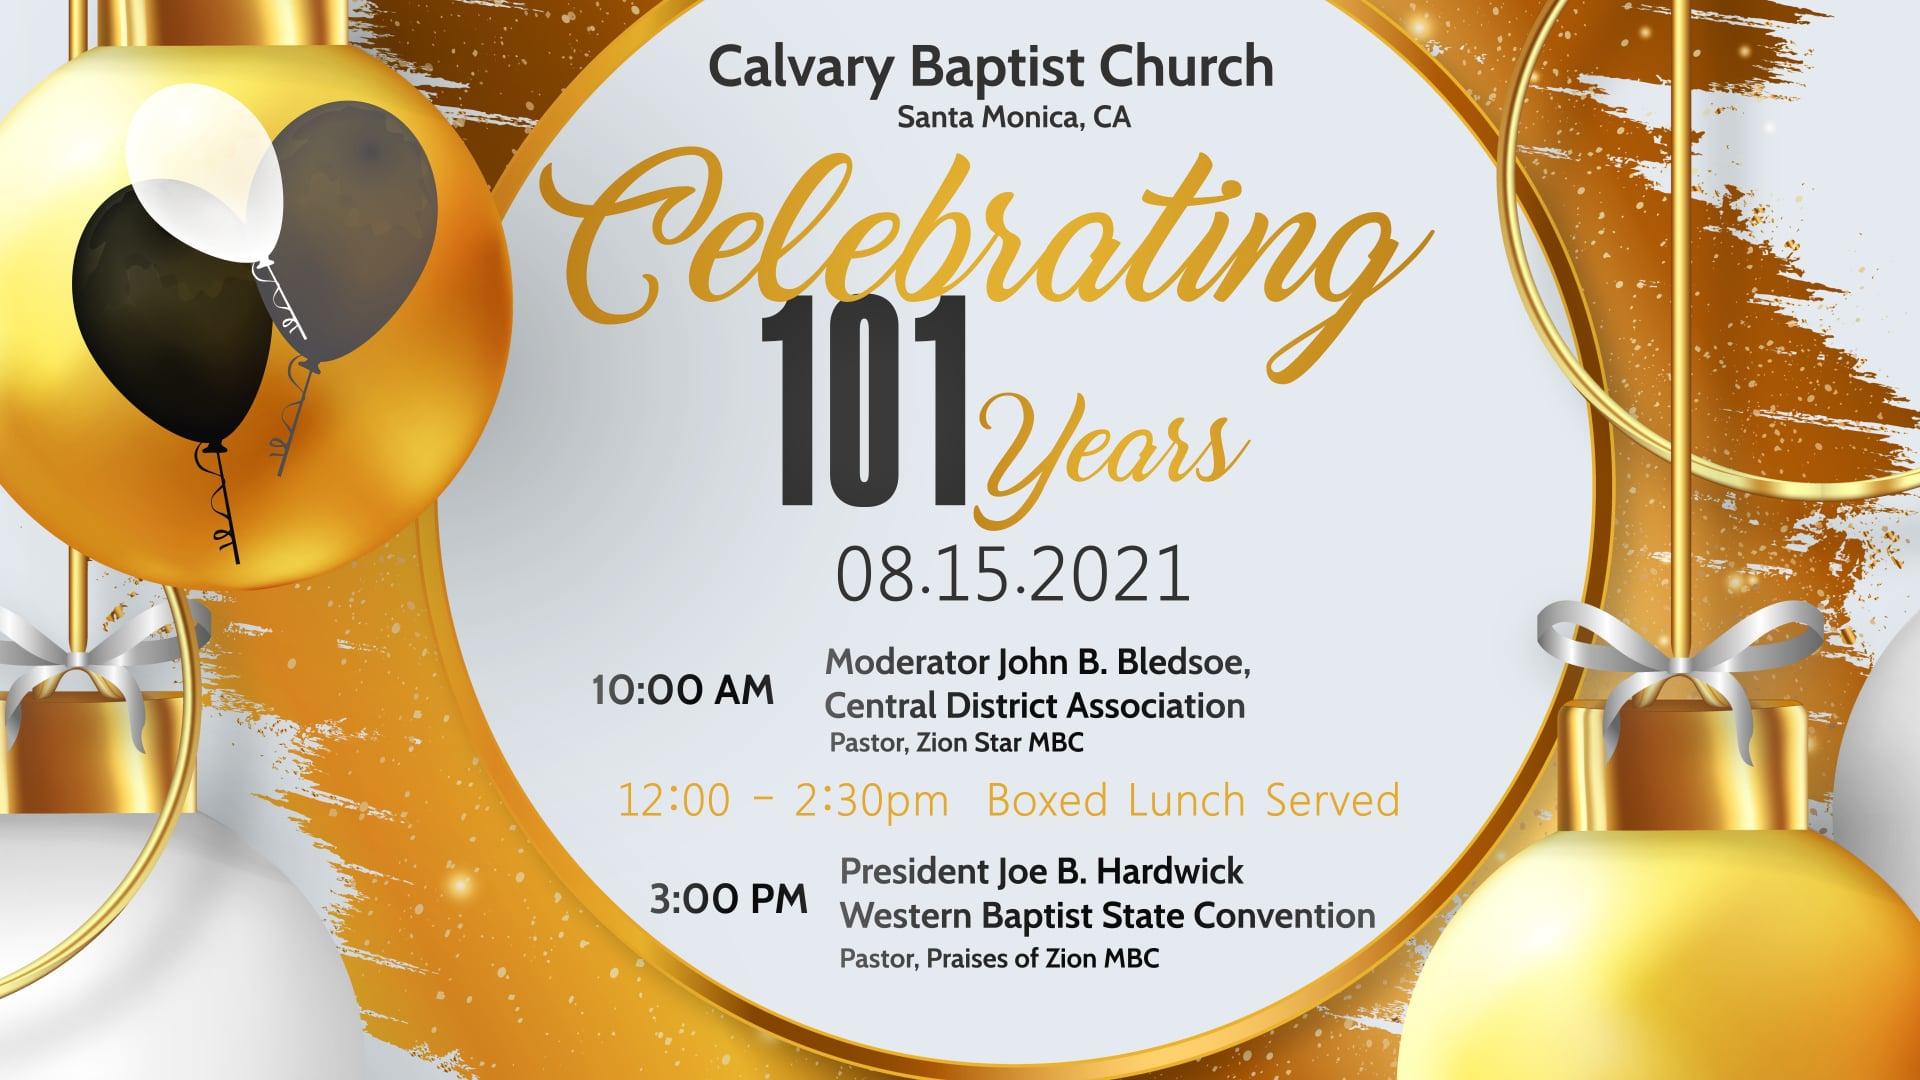 10:30AM 101st Anniversary Service 2021.08.15